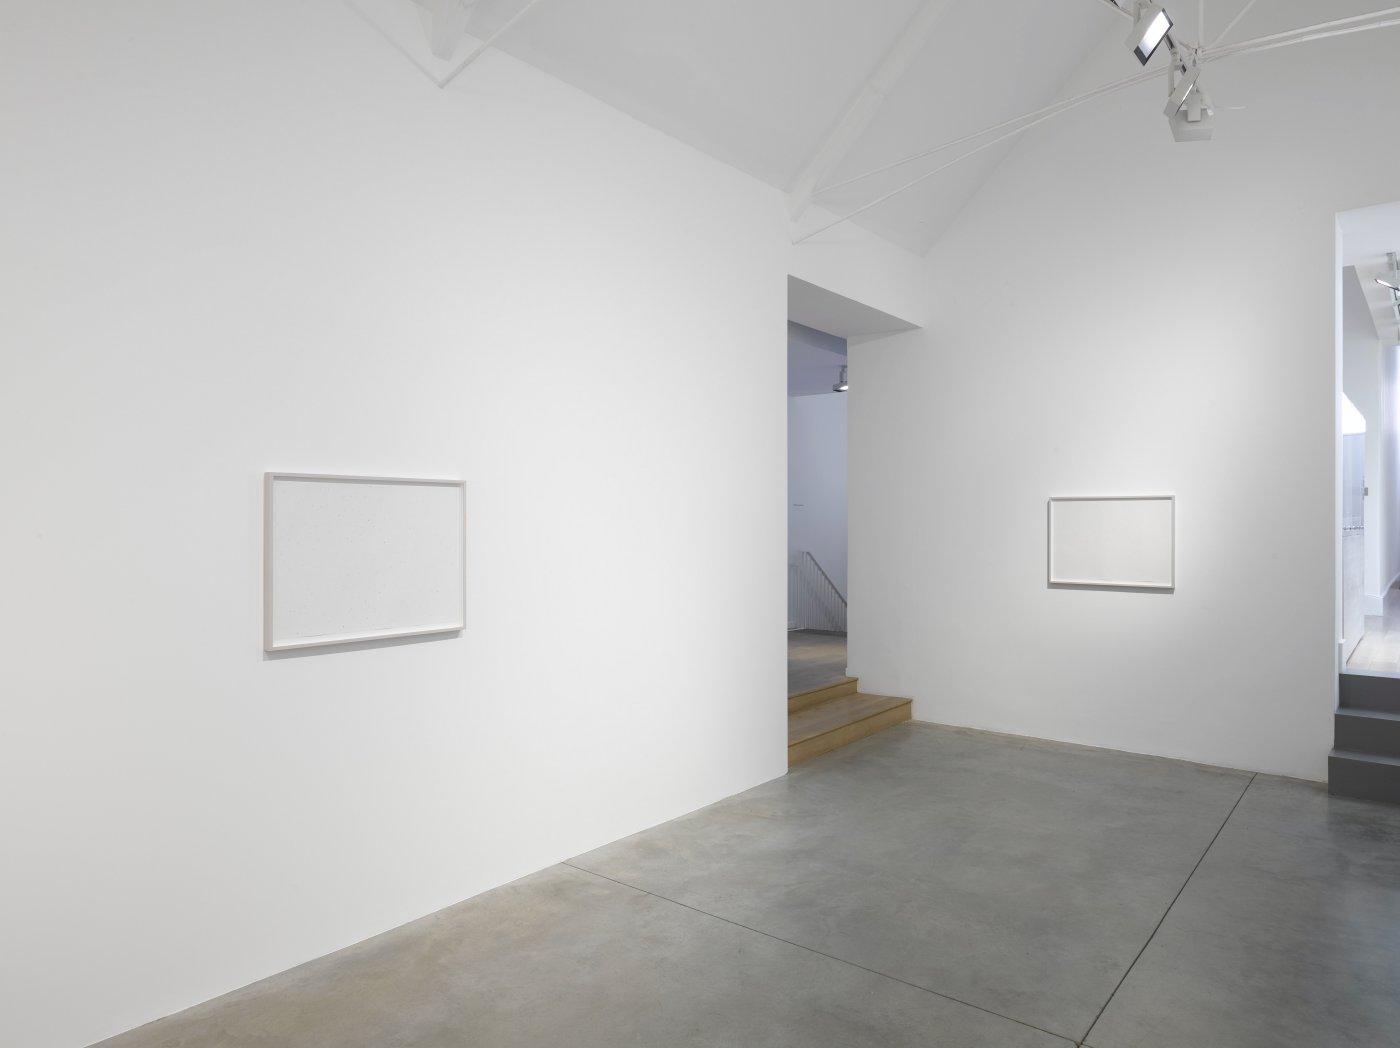 Lisson Gallery Bell Street Spencer Finch 7